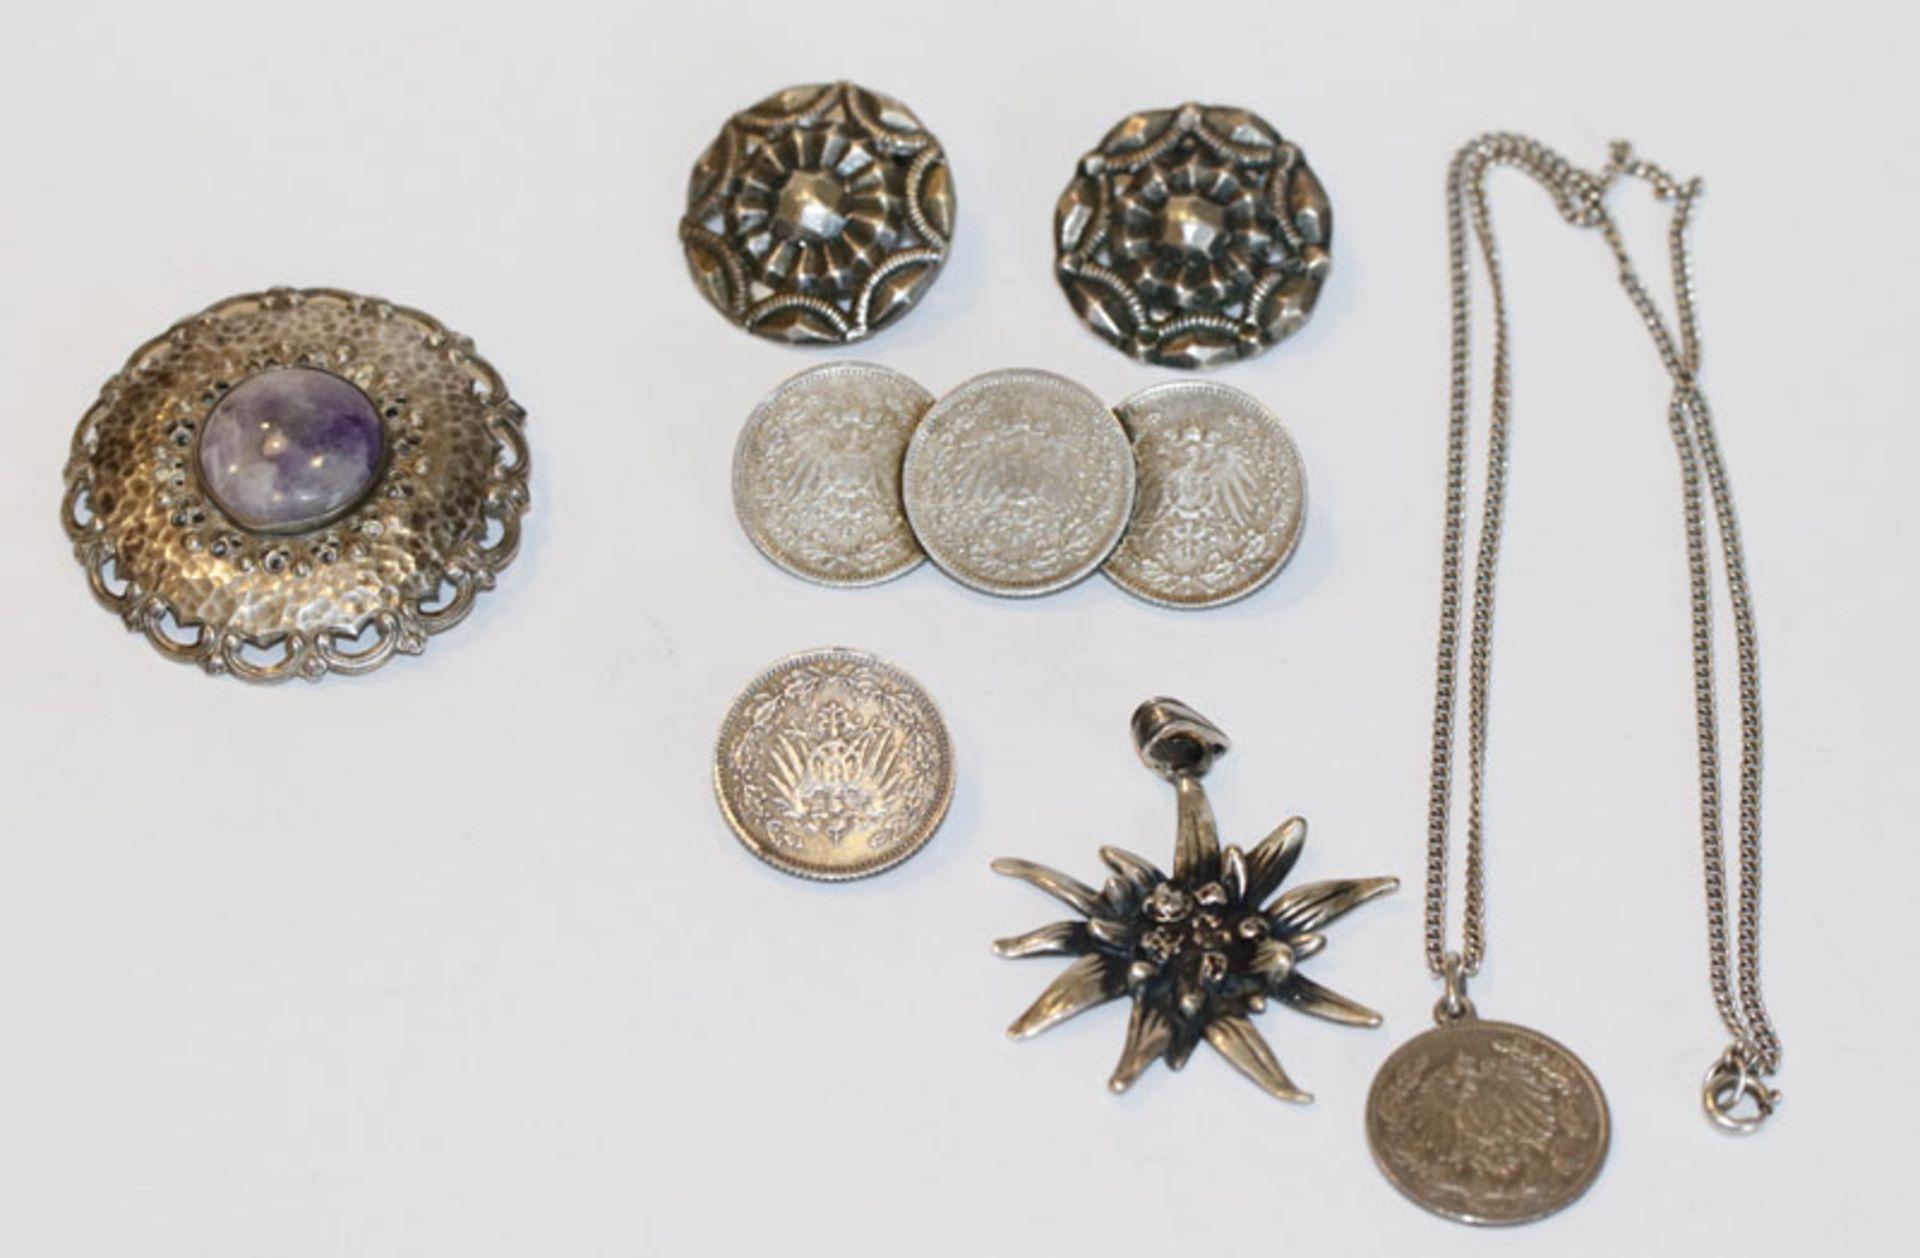 Silber Schmuck-Konvolut: Brosche, D 4 cm, Paar Ohrclips, D 2,5 cm, Tuchnadel, B 5 cm, Anhänger in